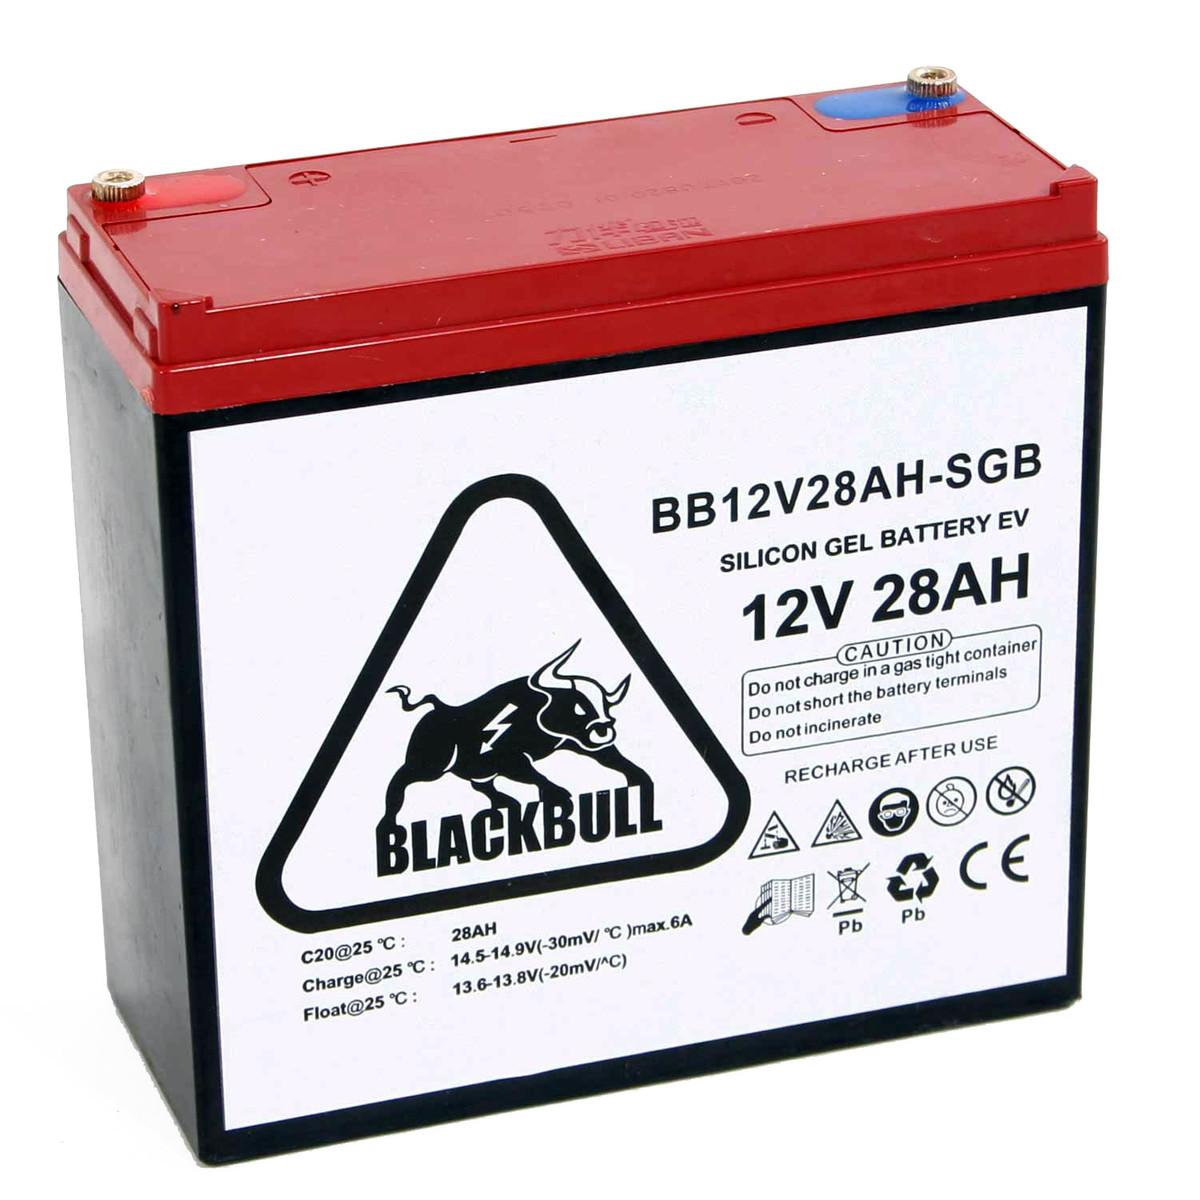 Blackbull pro 12V 28AH Akku Zyklenfest XXL Schraub -SGB